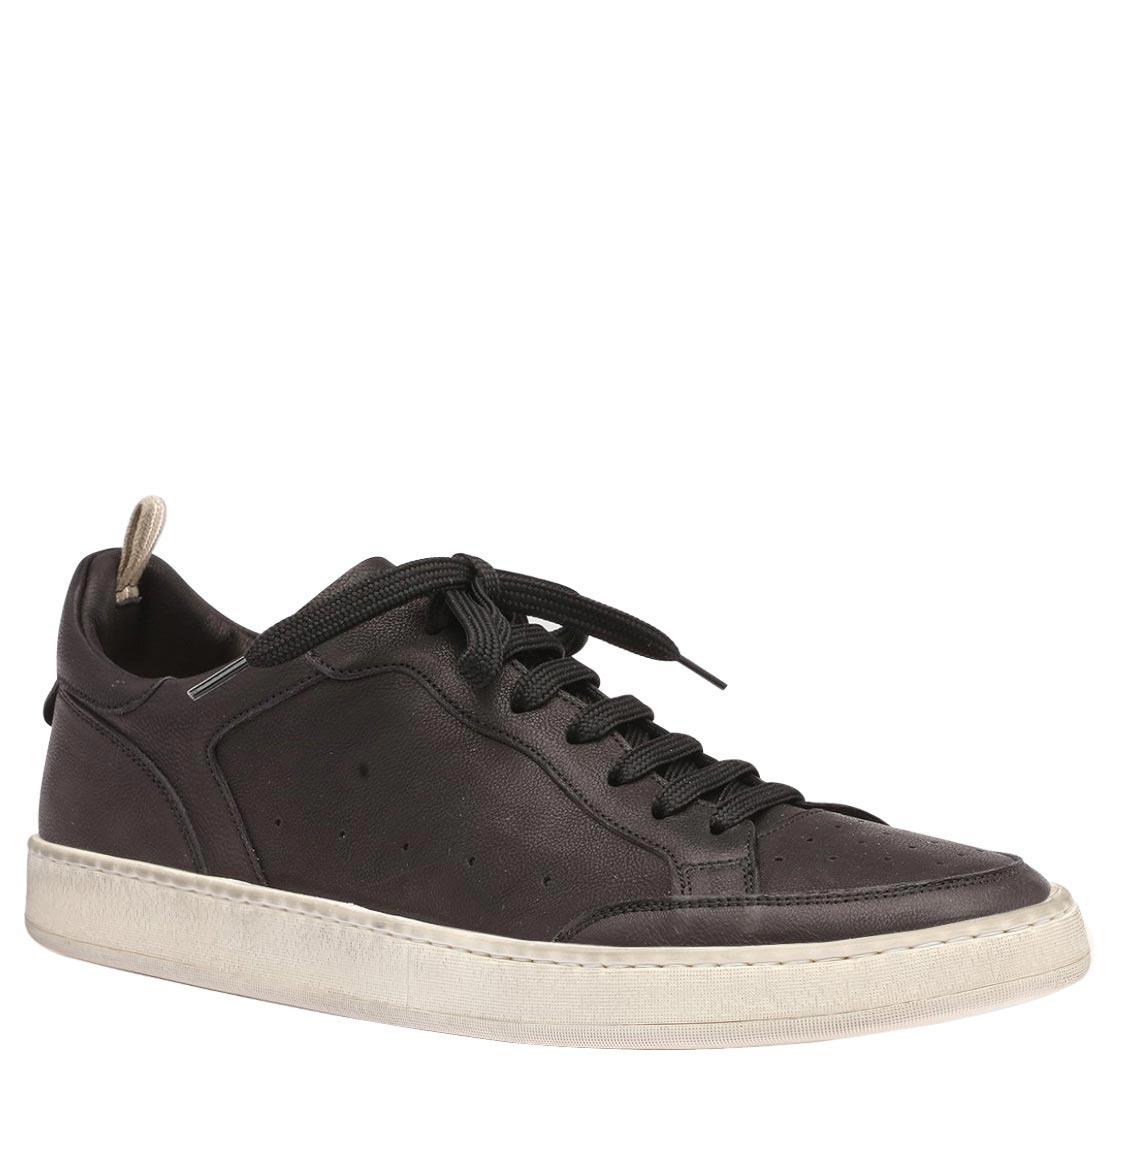 Officine Creative Kareem Dirty Black Leather Sneakers